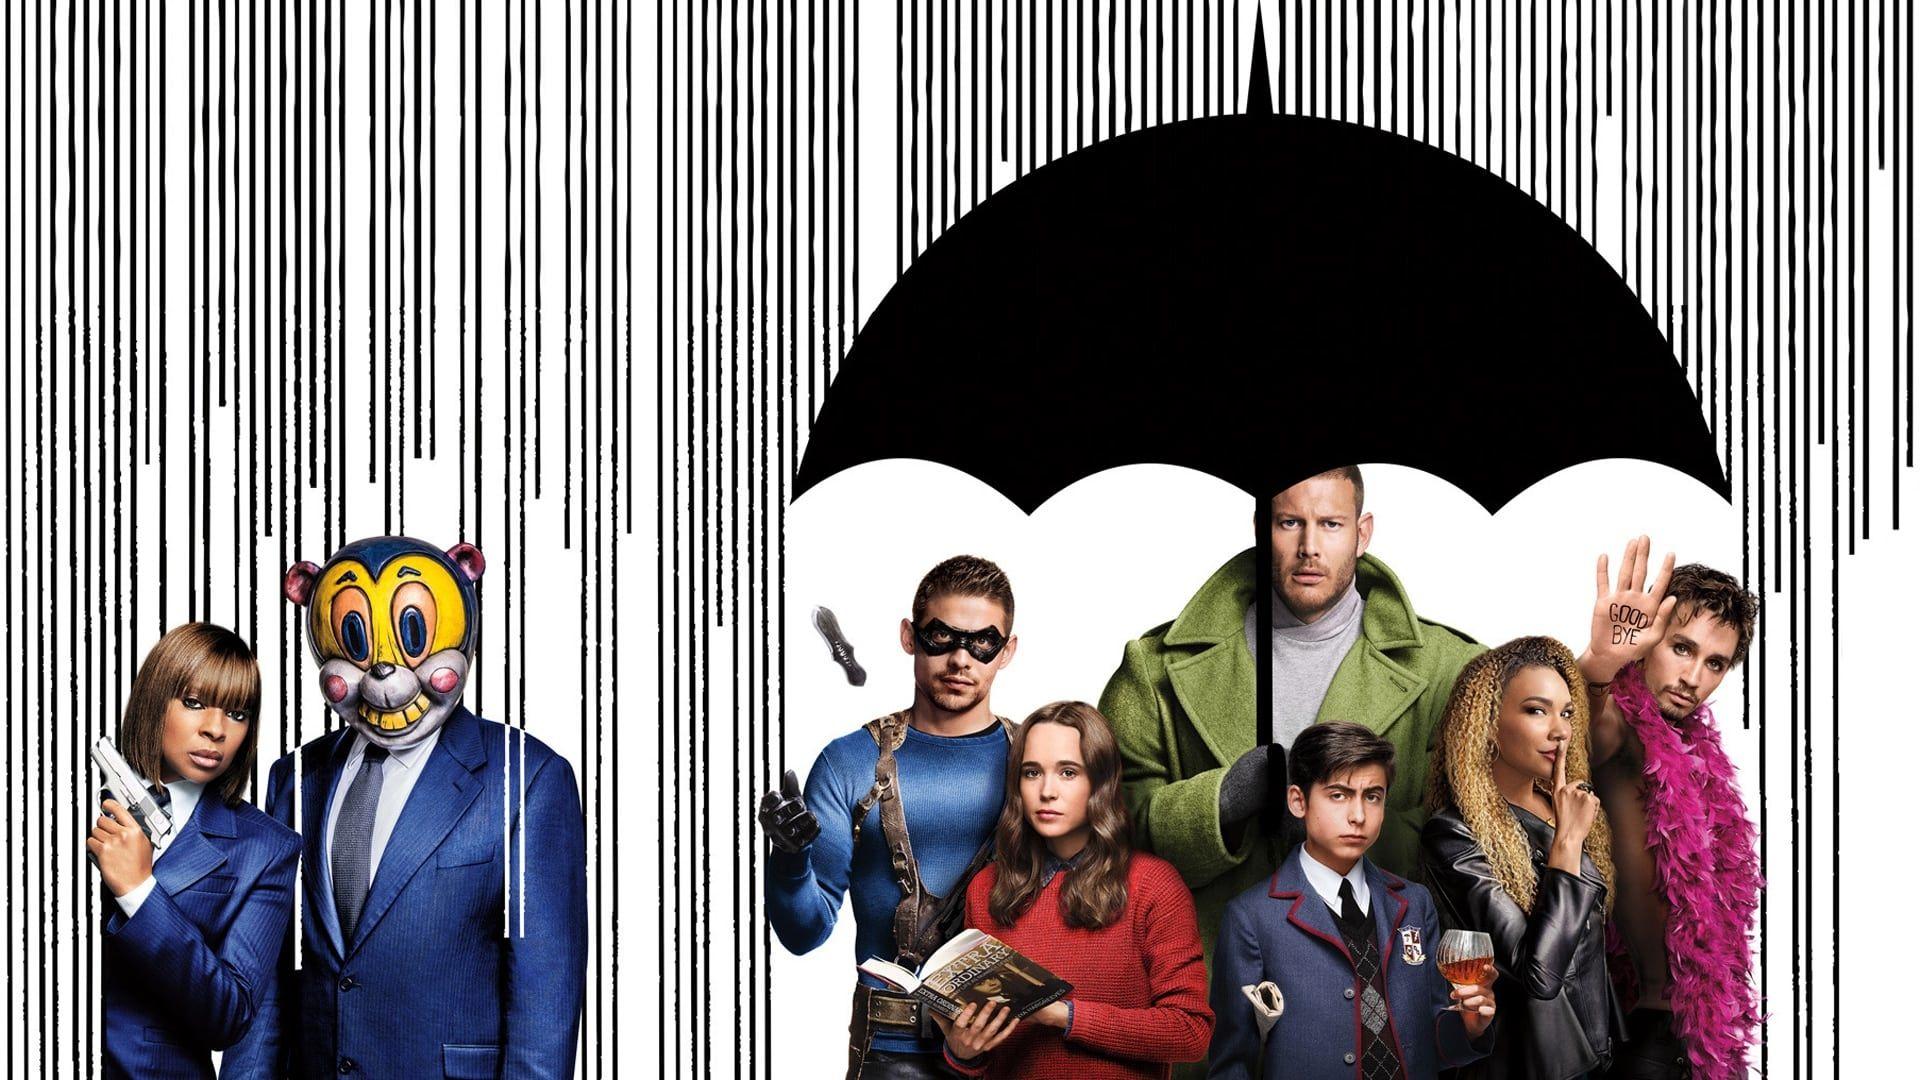 7-dark-superhero-series-to-watch-during-social-distancing-7